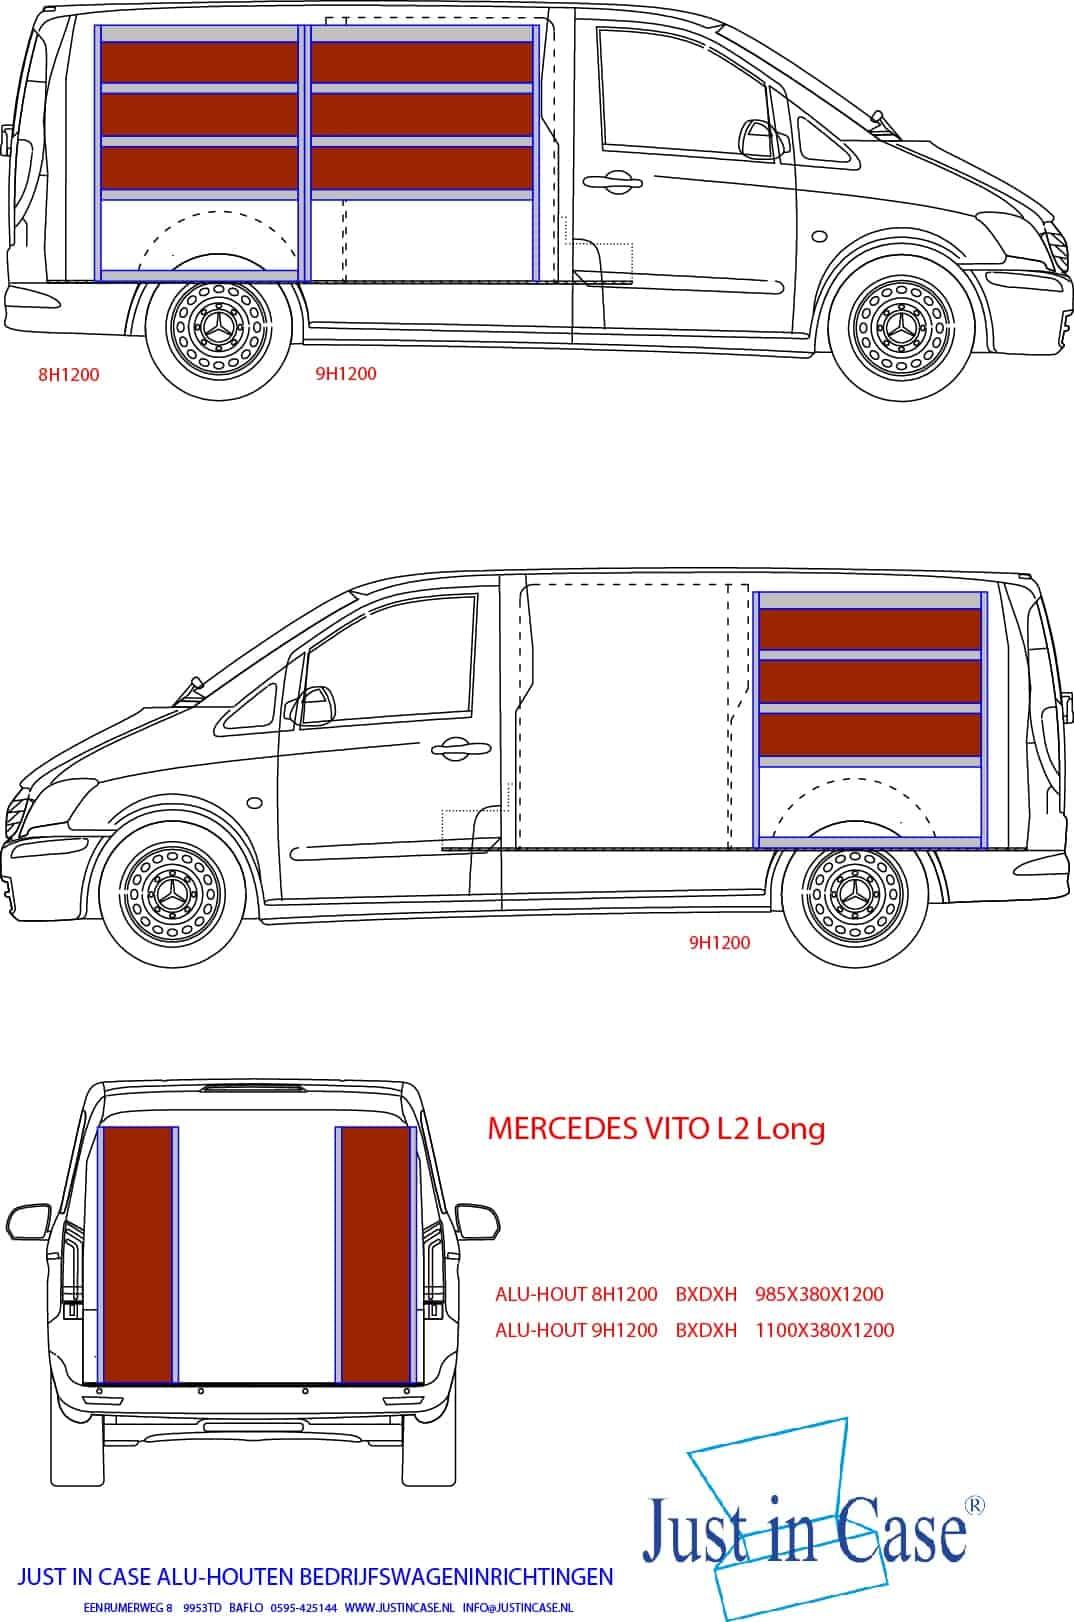 Mercedes Vito (L2) bedrijfswageninirchting